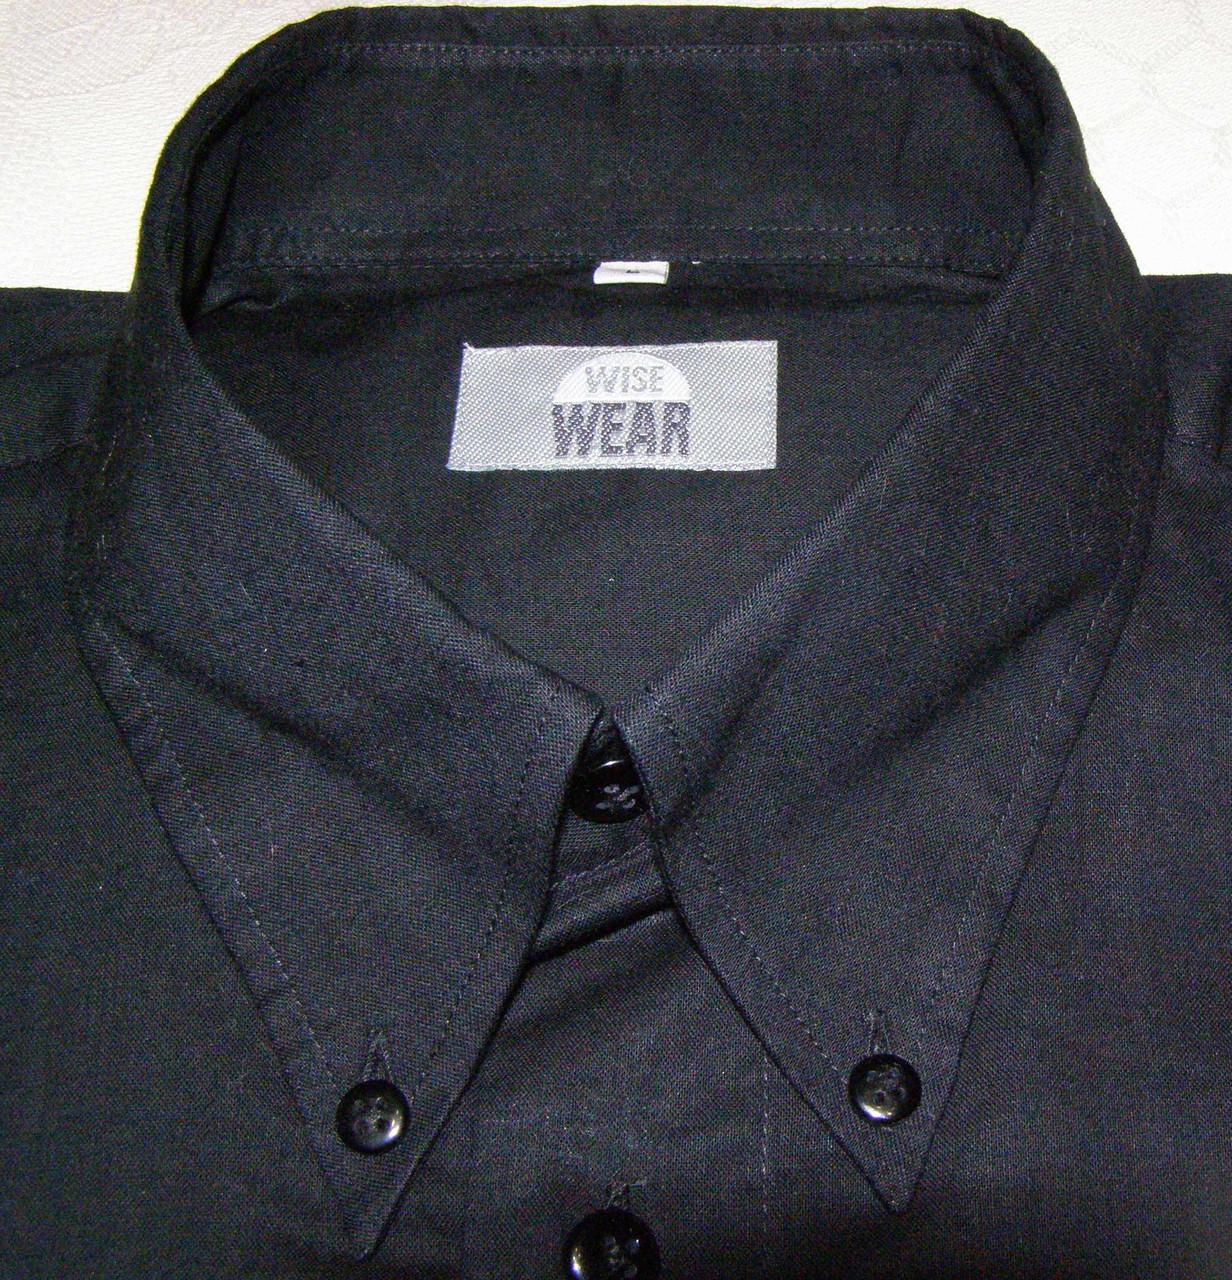 Рубашка мужская WISE WEAR (L/41-42)